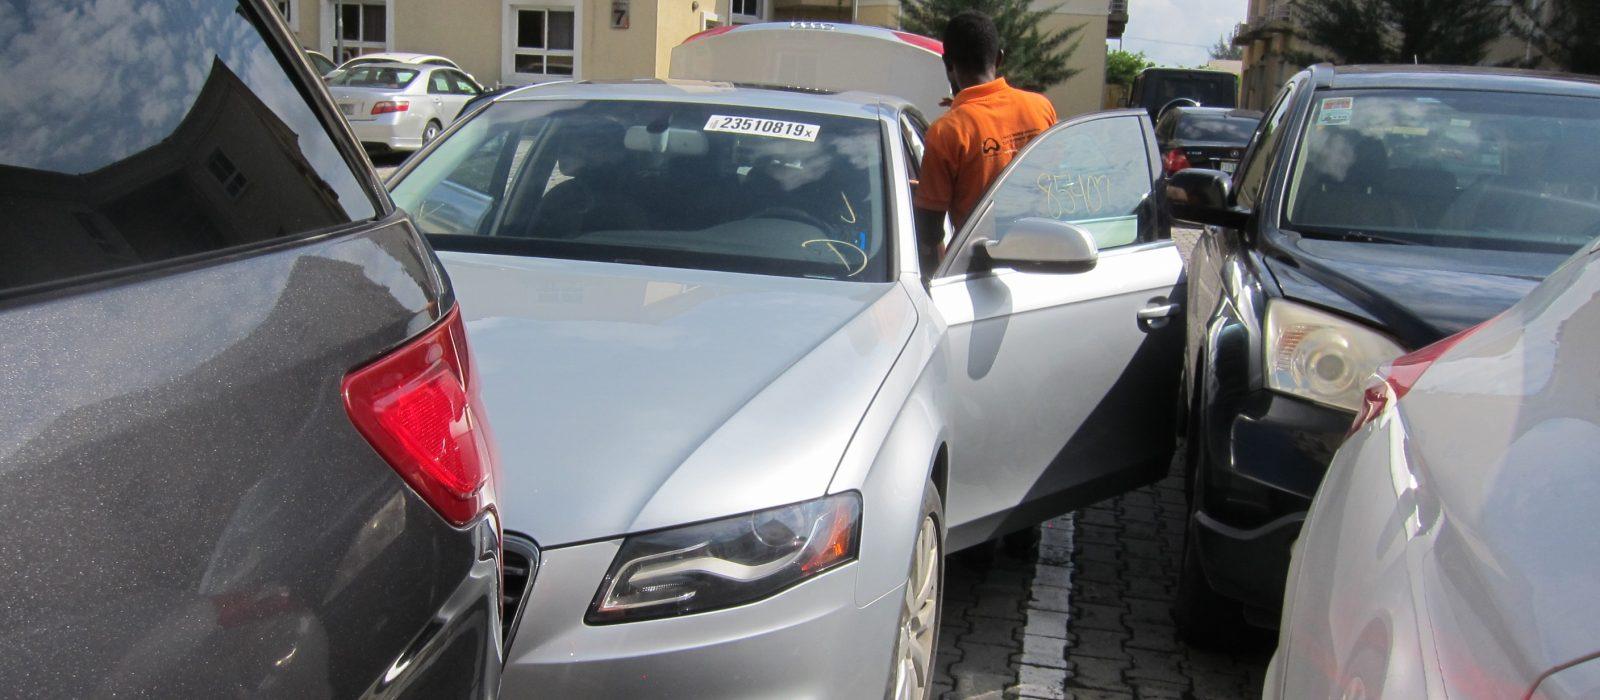 Audi A5 Interior plus engine waterless detailing